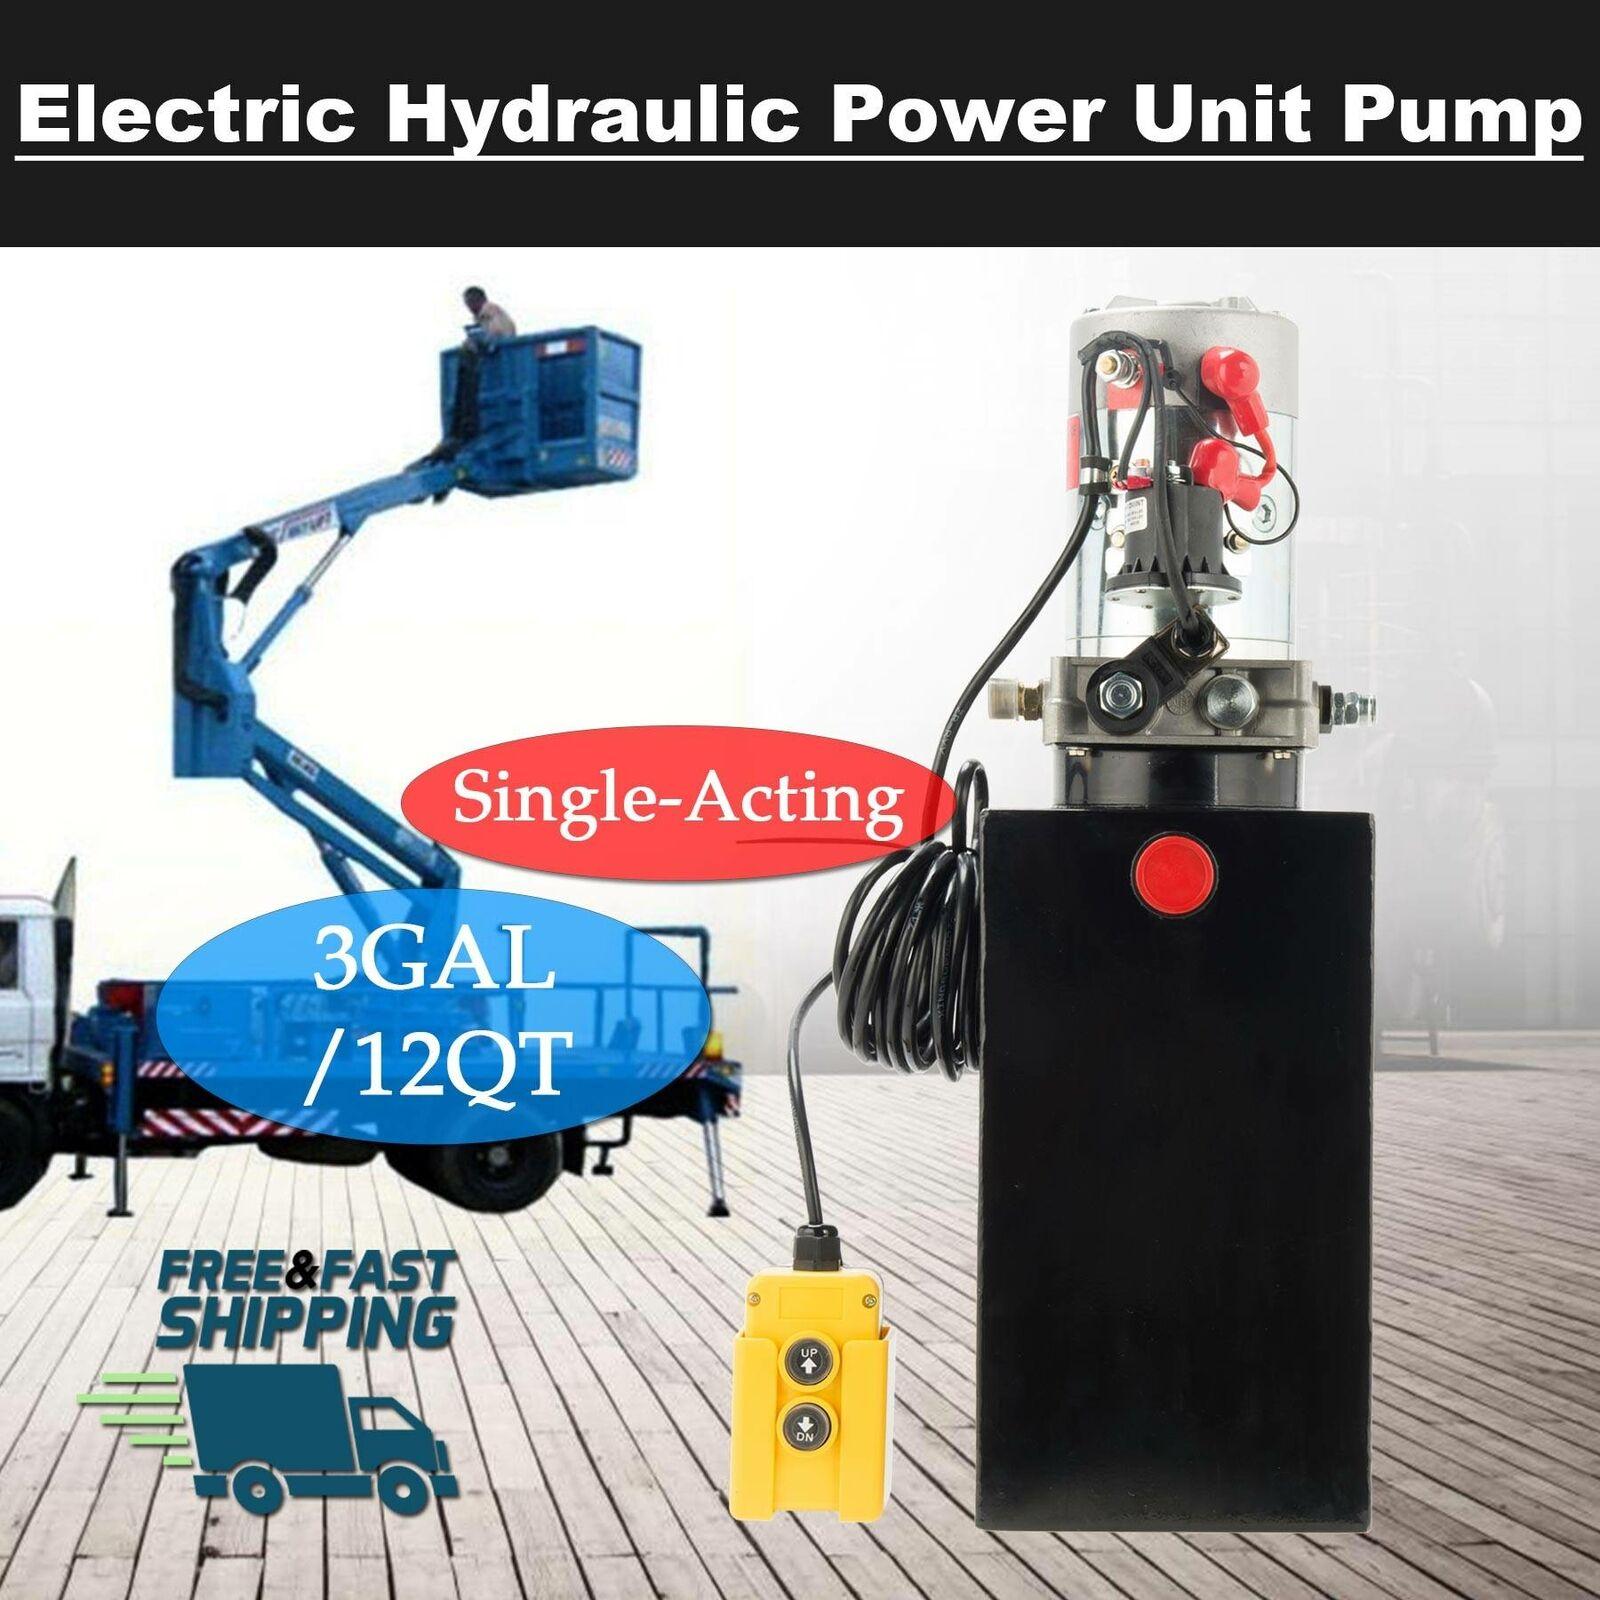 Bestauto 15 Quart Hydraulic Pump Single Acting Hydraulic Power Unit Dump Trailer Hydraulic Pump 12V Electric Hydraulic Pump with Plastic Hydraulic Reservoir for Car Lift